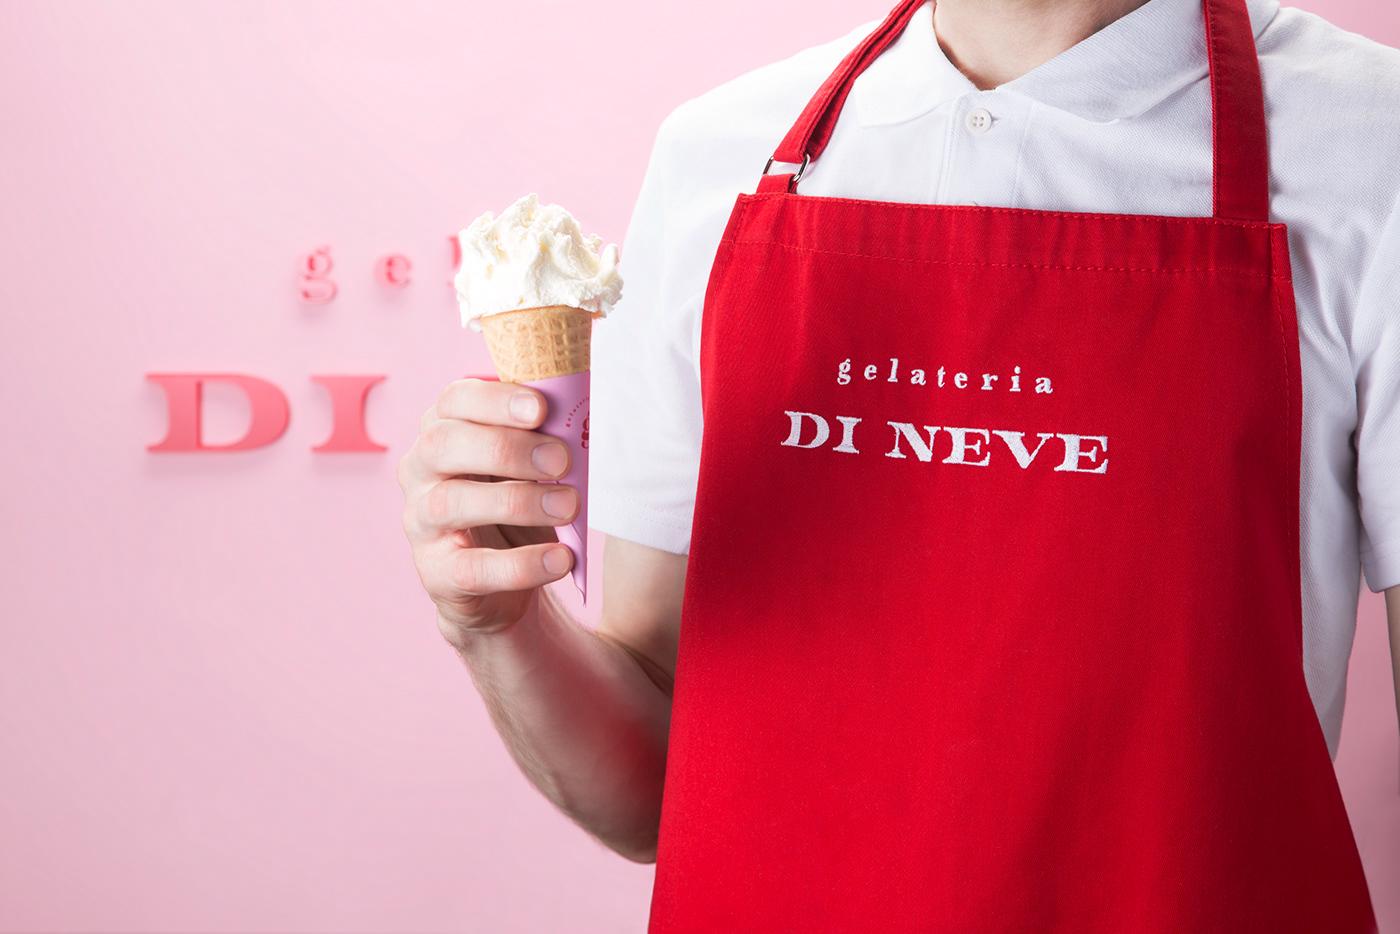 Food  Packaging ice cream Gelato cafe restaurant ILLUSTRATION